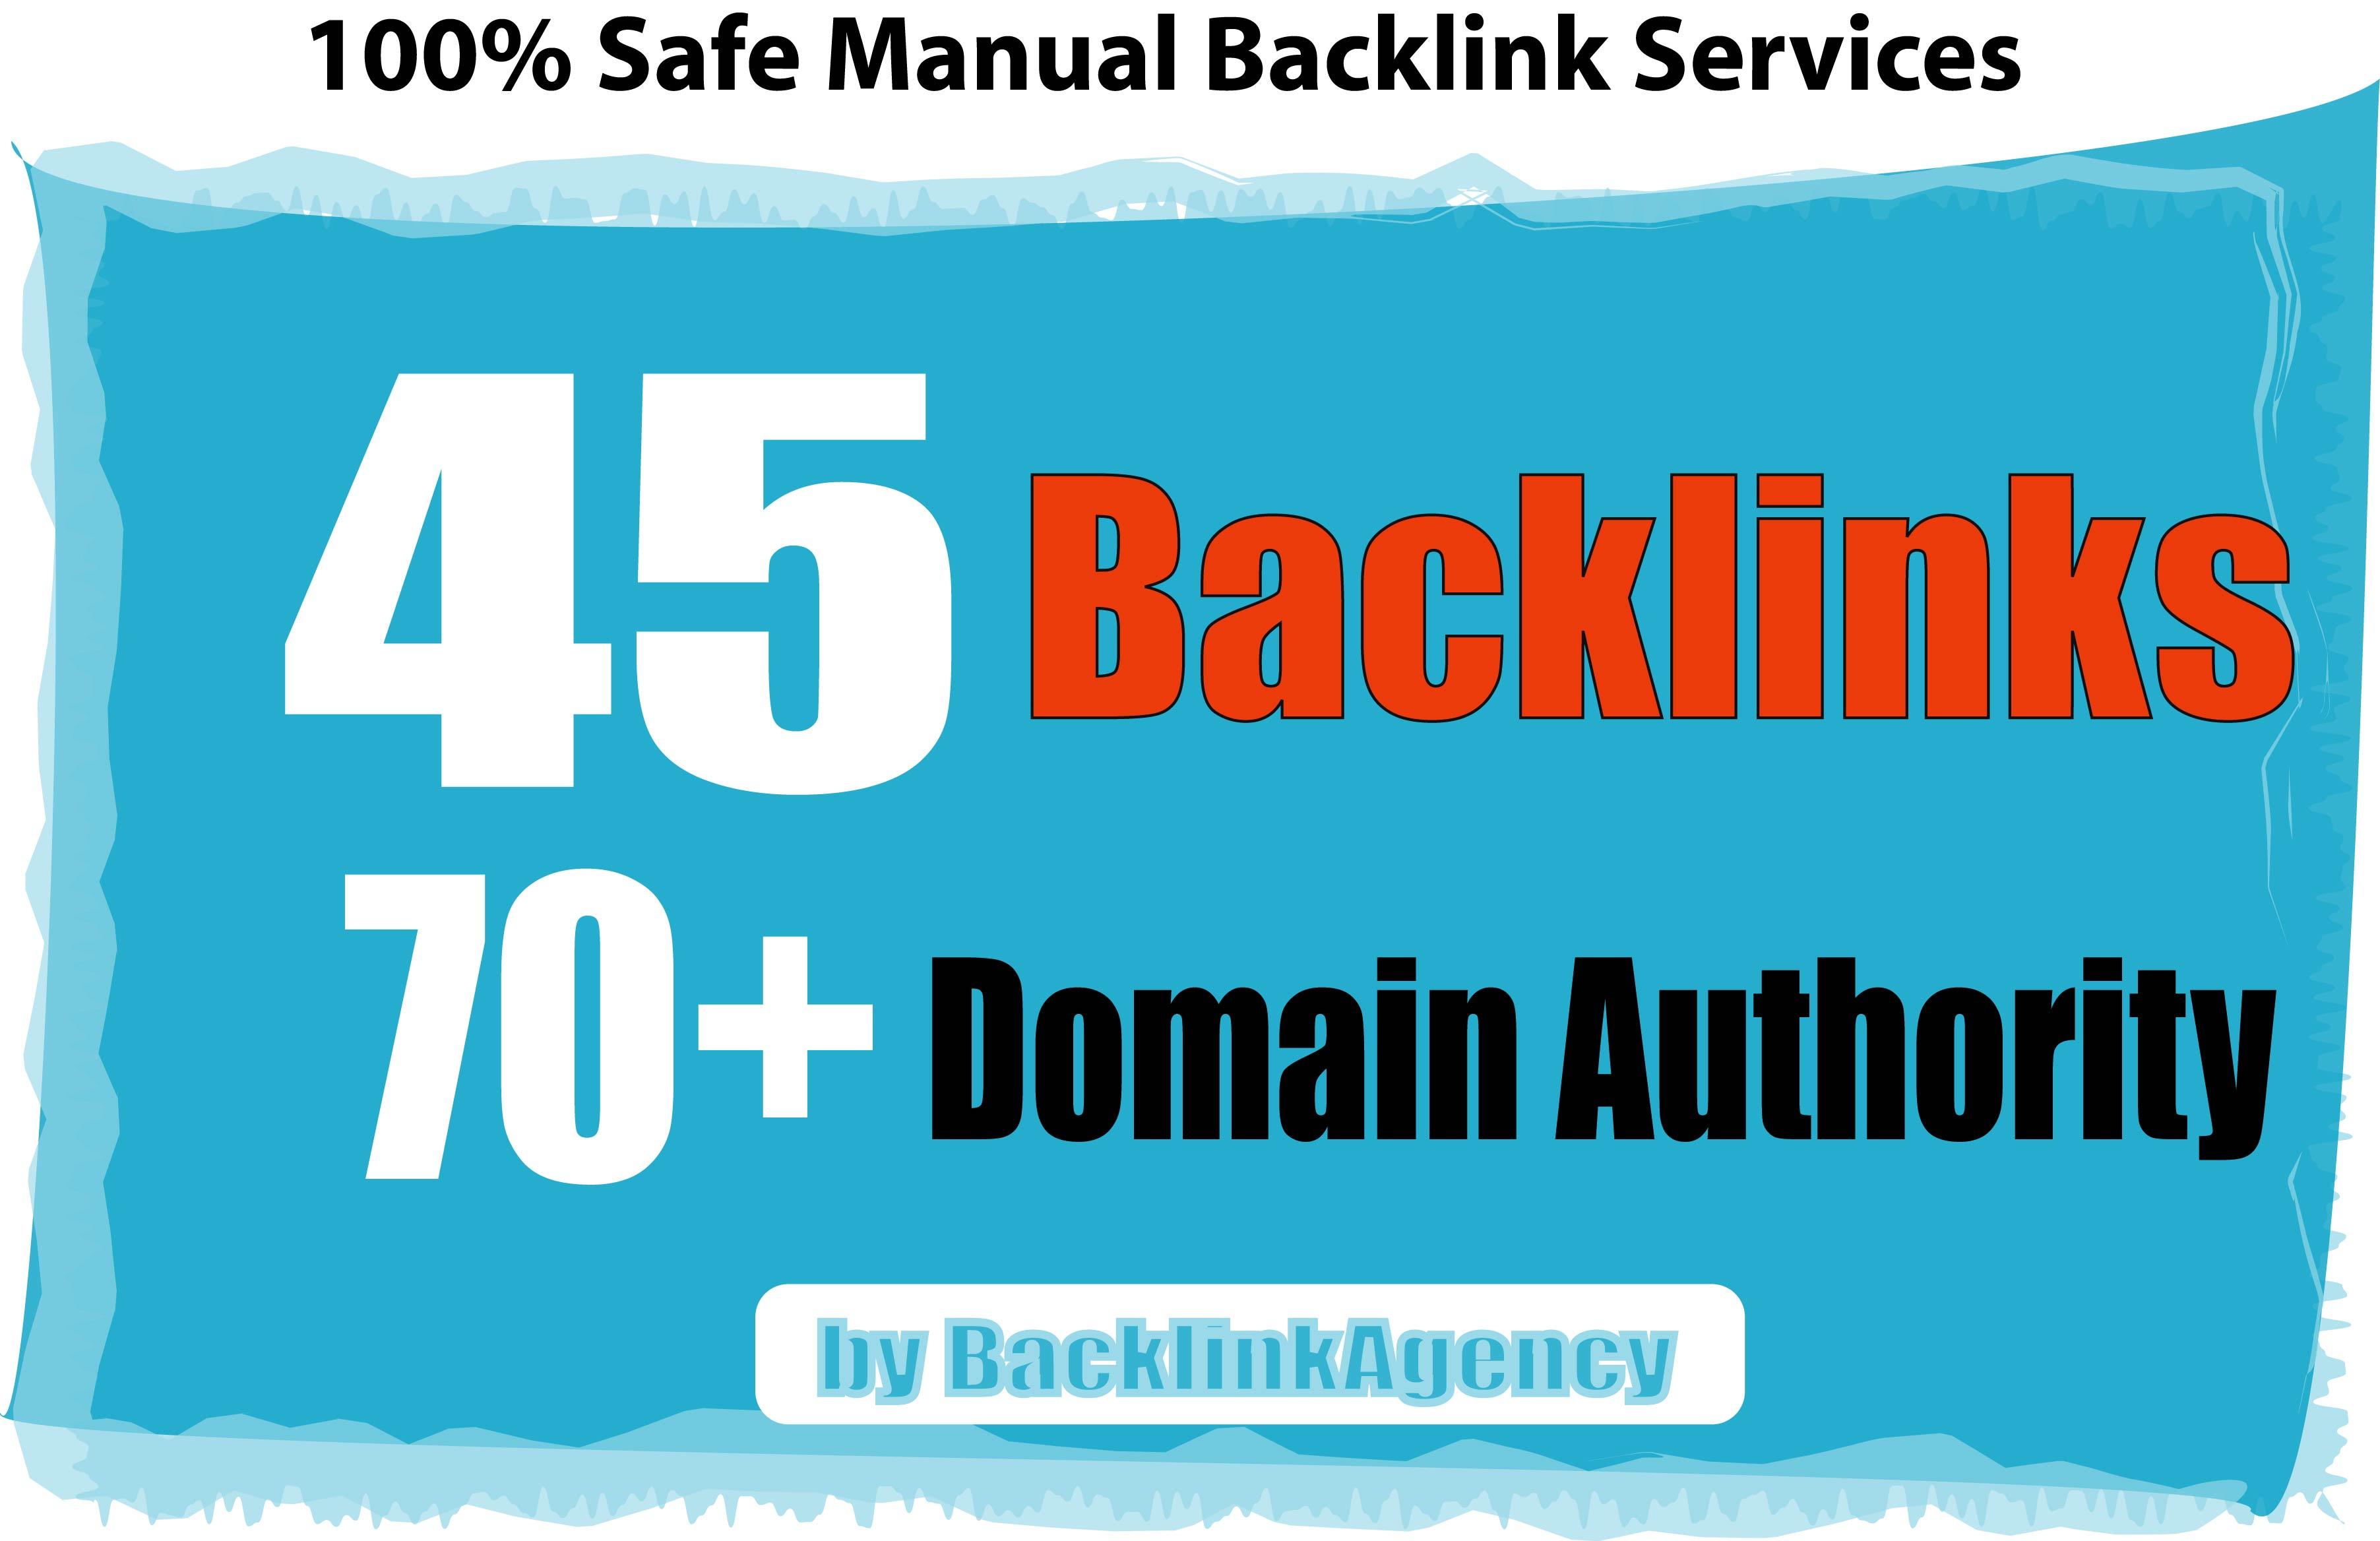 45 Backlinks from DA 75 High Domains,  Skyrocket Your Google RANKINGS NOW